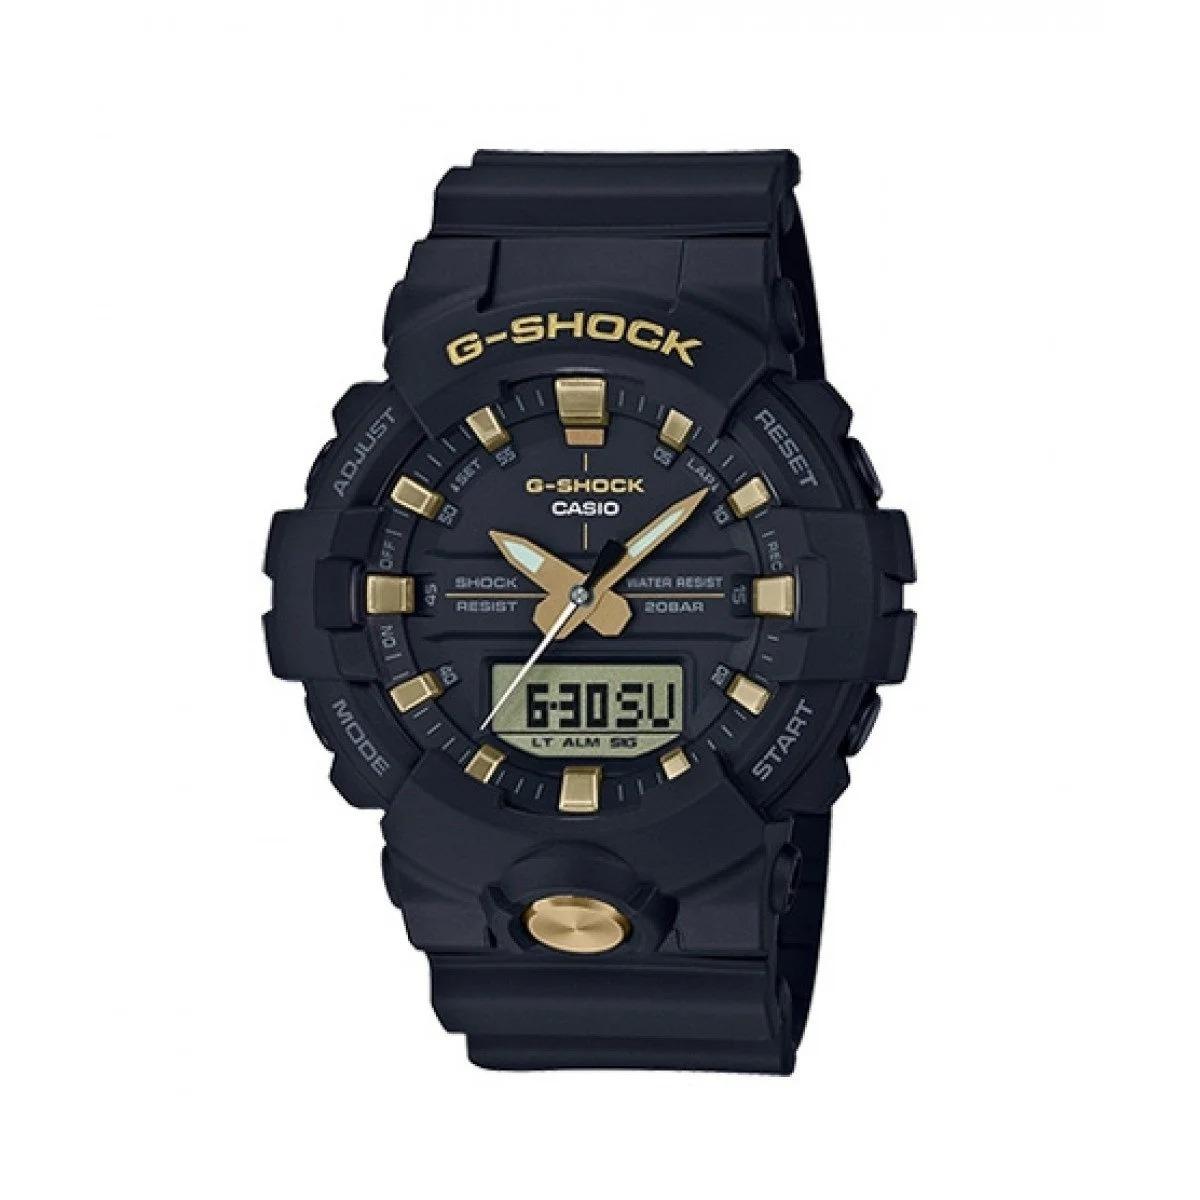 Casio Men's GA810B-1A9 'G-Shock' Black Silicone Watch